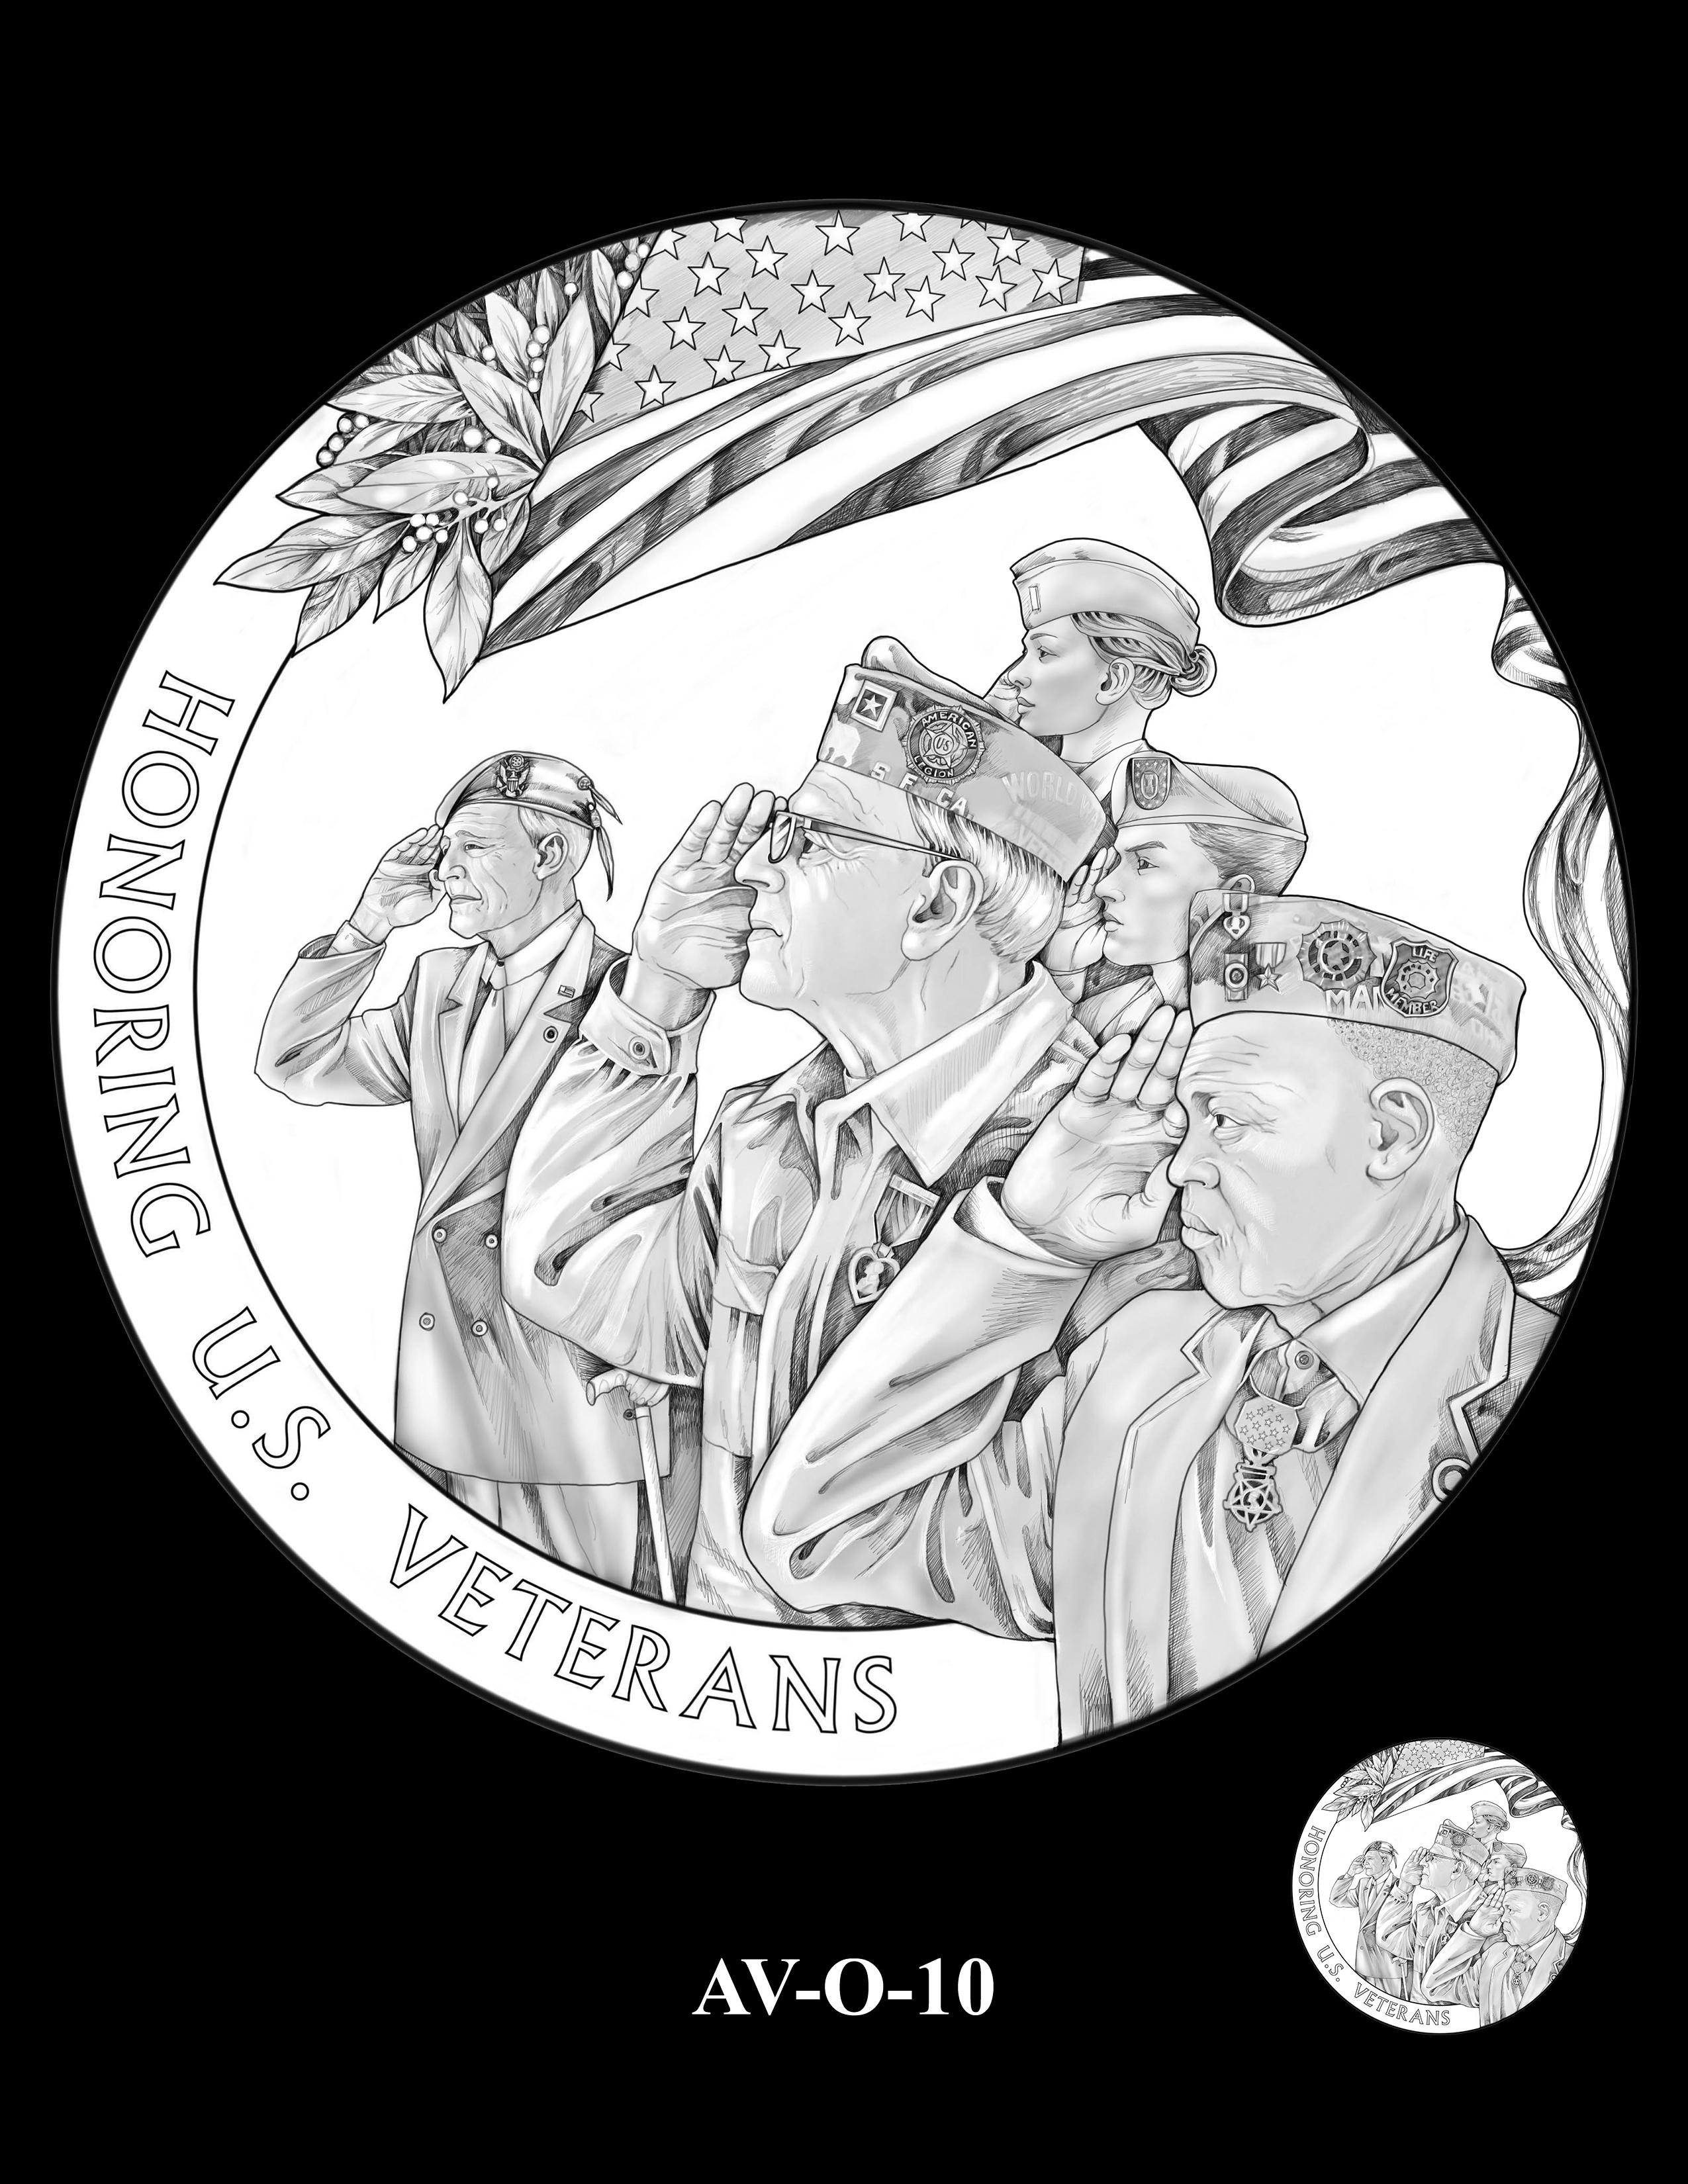 AV-O-10 - American Veterans Medal